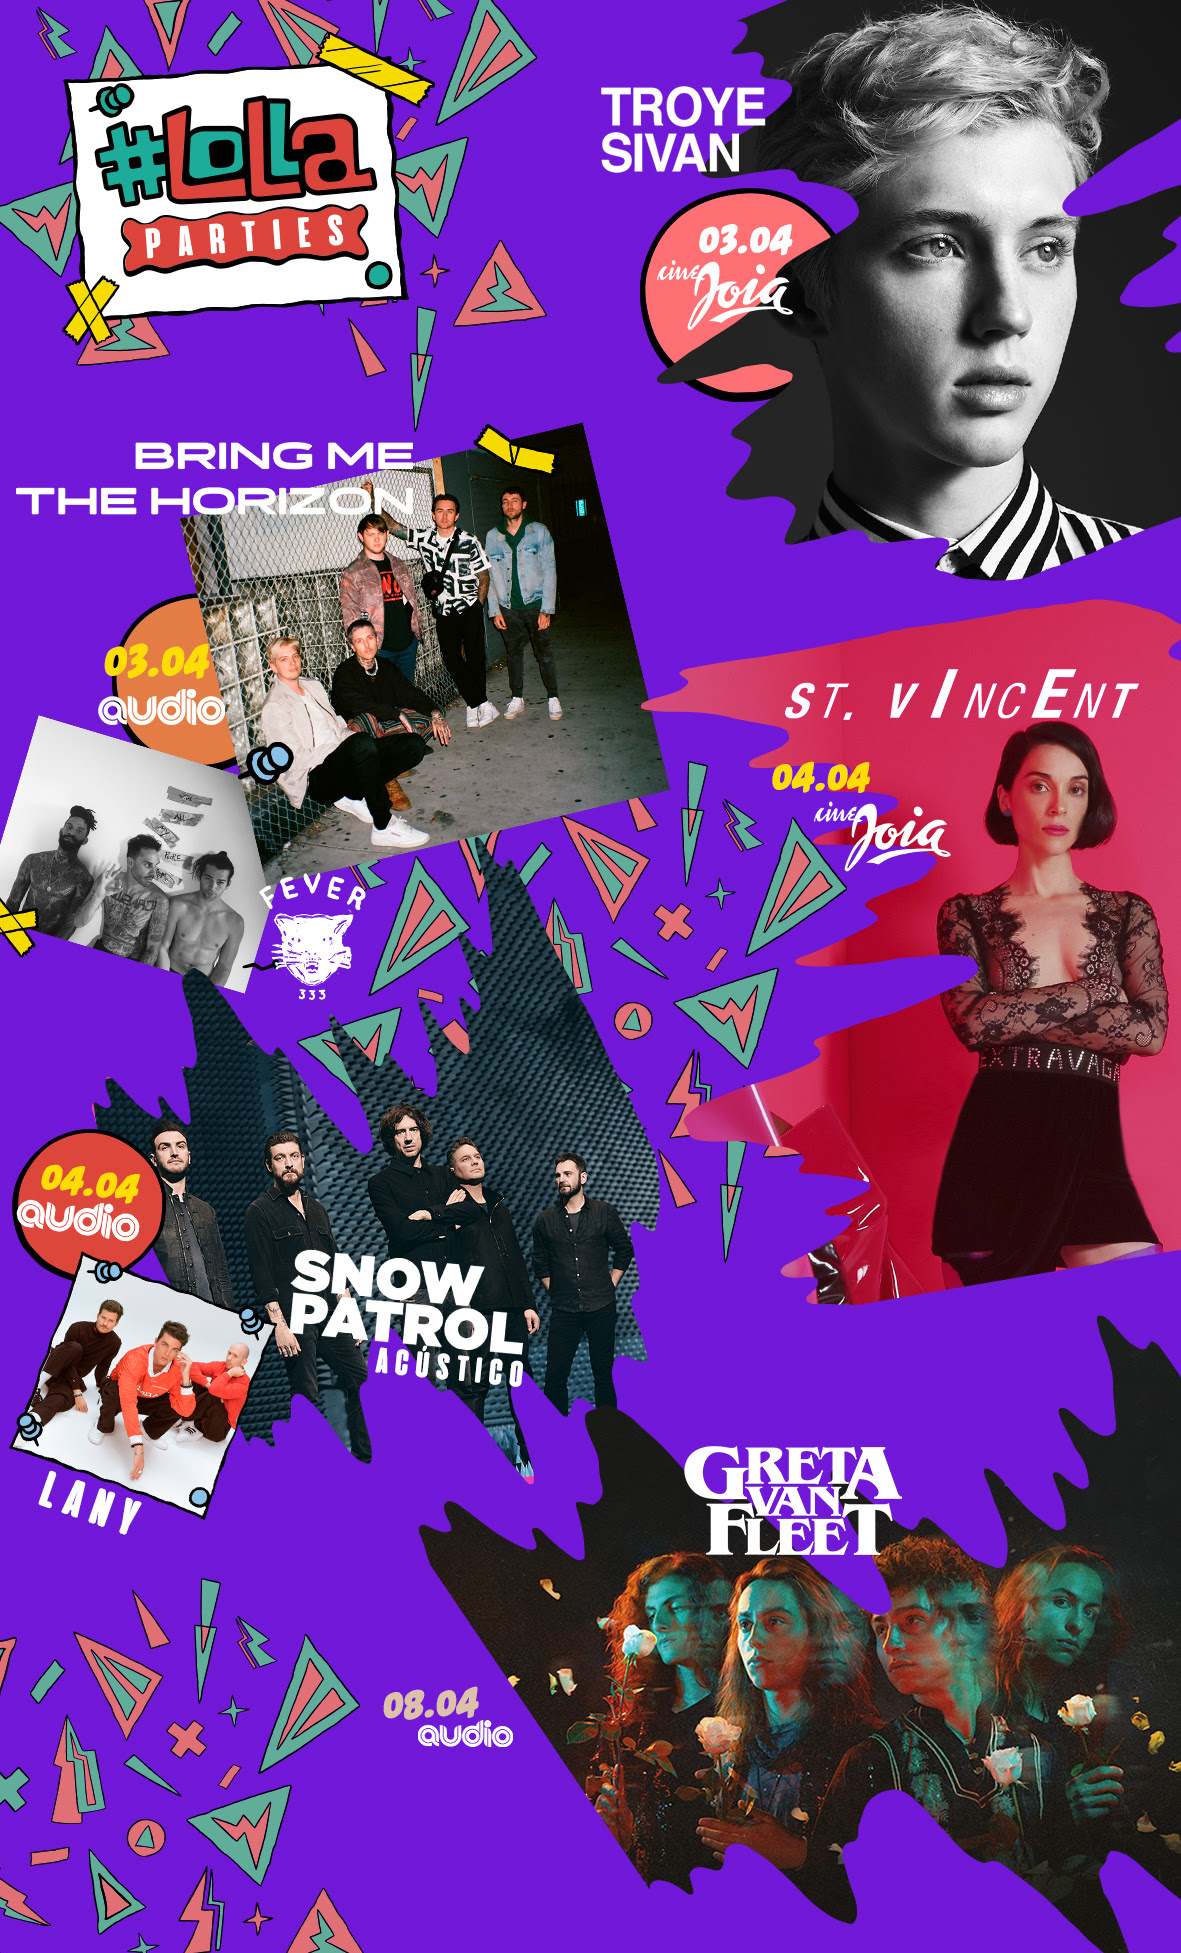 Lolla Parties: Lollapalooza Brasil 2019 anuncia shows solo em São Paulo